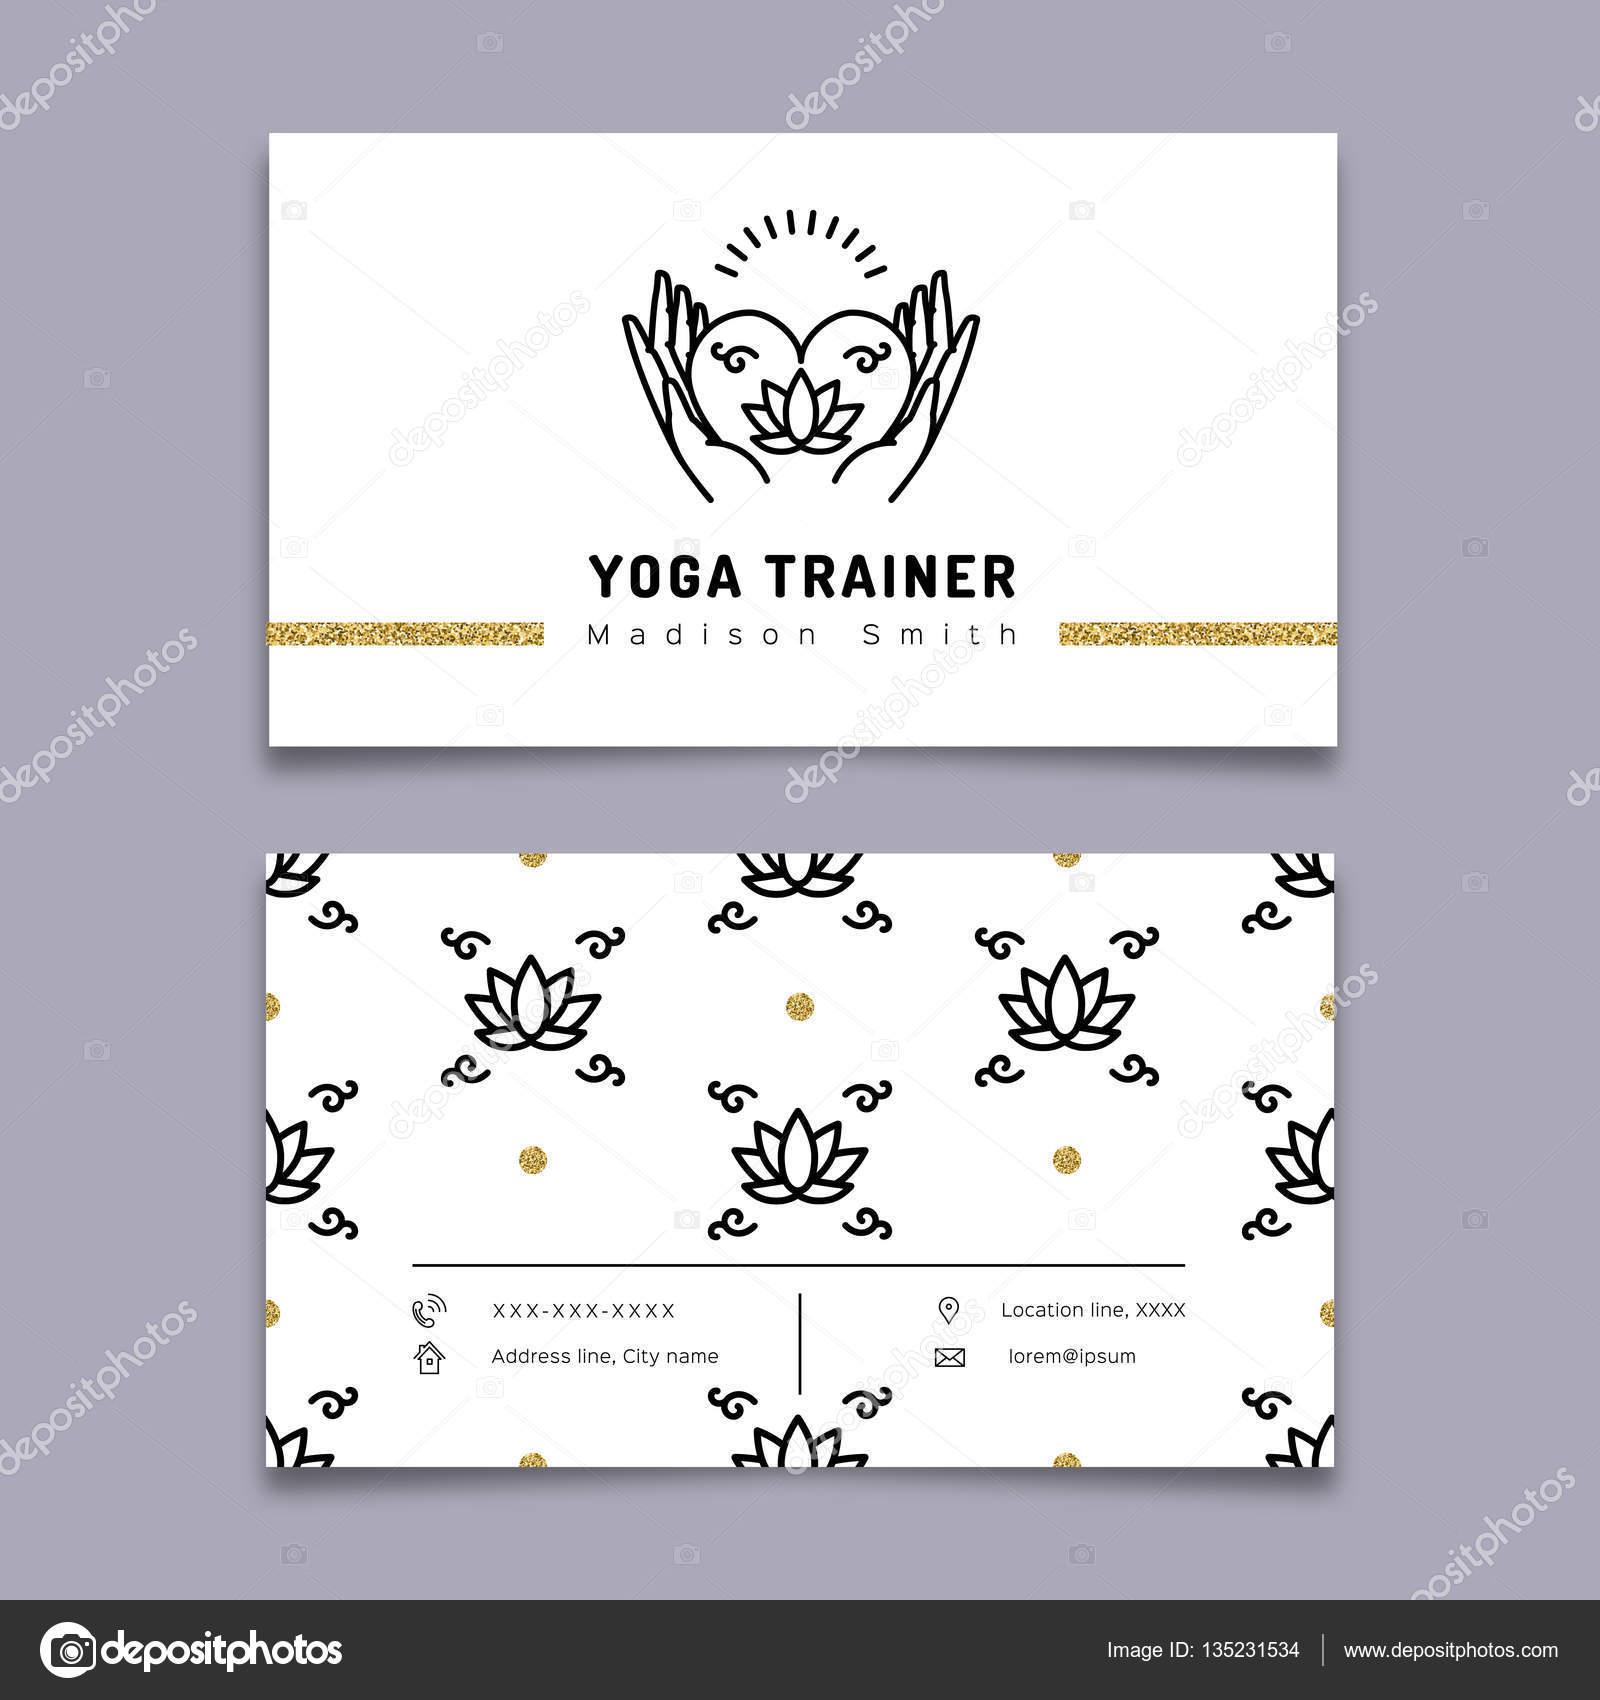 Vektor-Yoga Trainer Visitenkarte Vorlage, Meditation-Symbol, Lotus ...